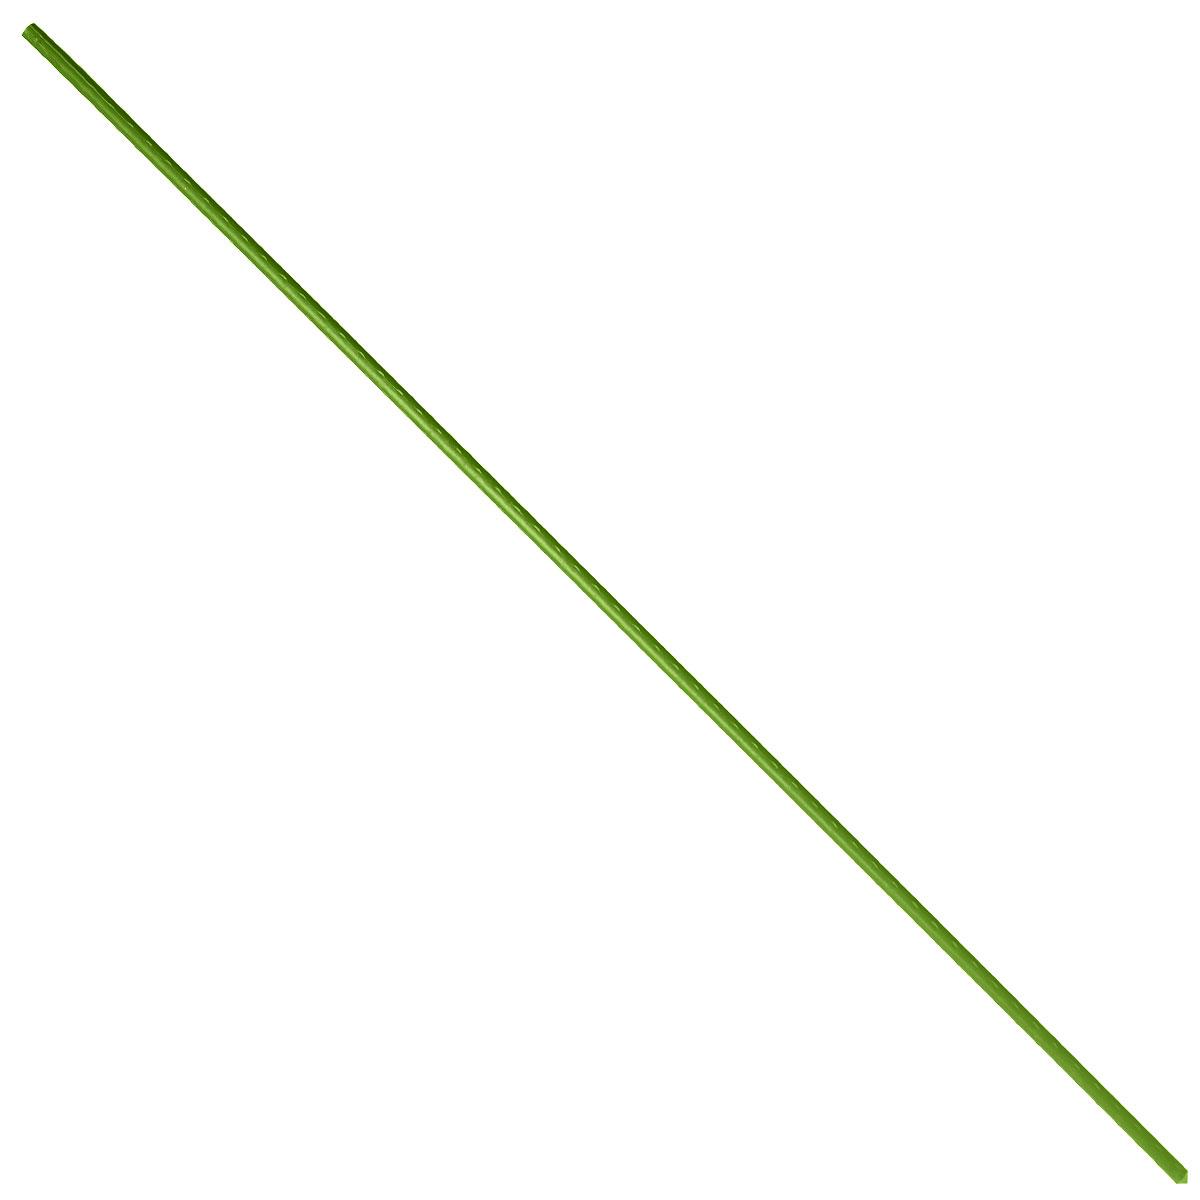 Опора для растений Green Apple, цвет: зеленый, диаметр 0,8 см, длина 75 см, 5 шт комплект для вьющихся растений сборный green apple glscl